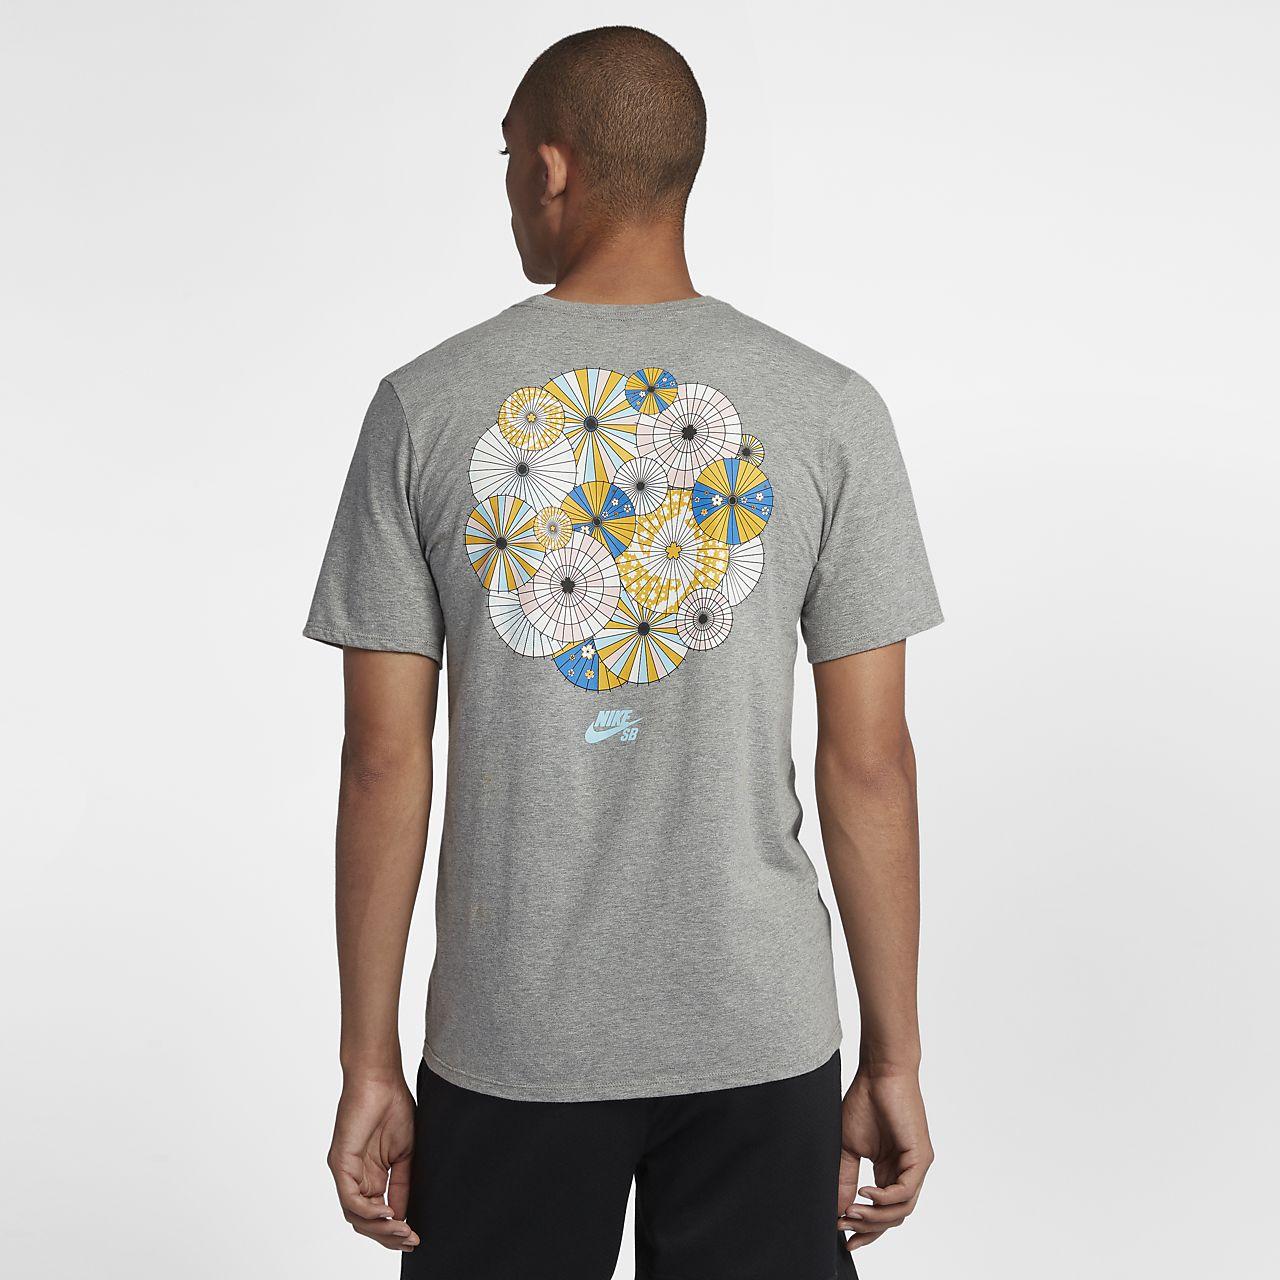 7647303e Nike SB Umbrella Men's T-Shirt. Nike.com